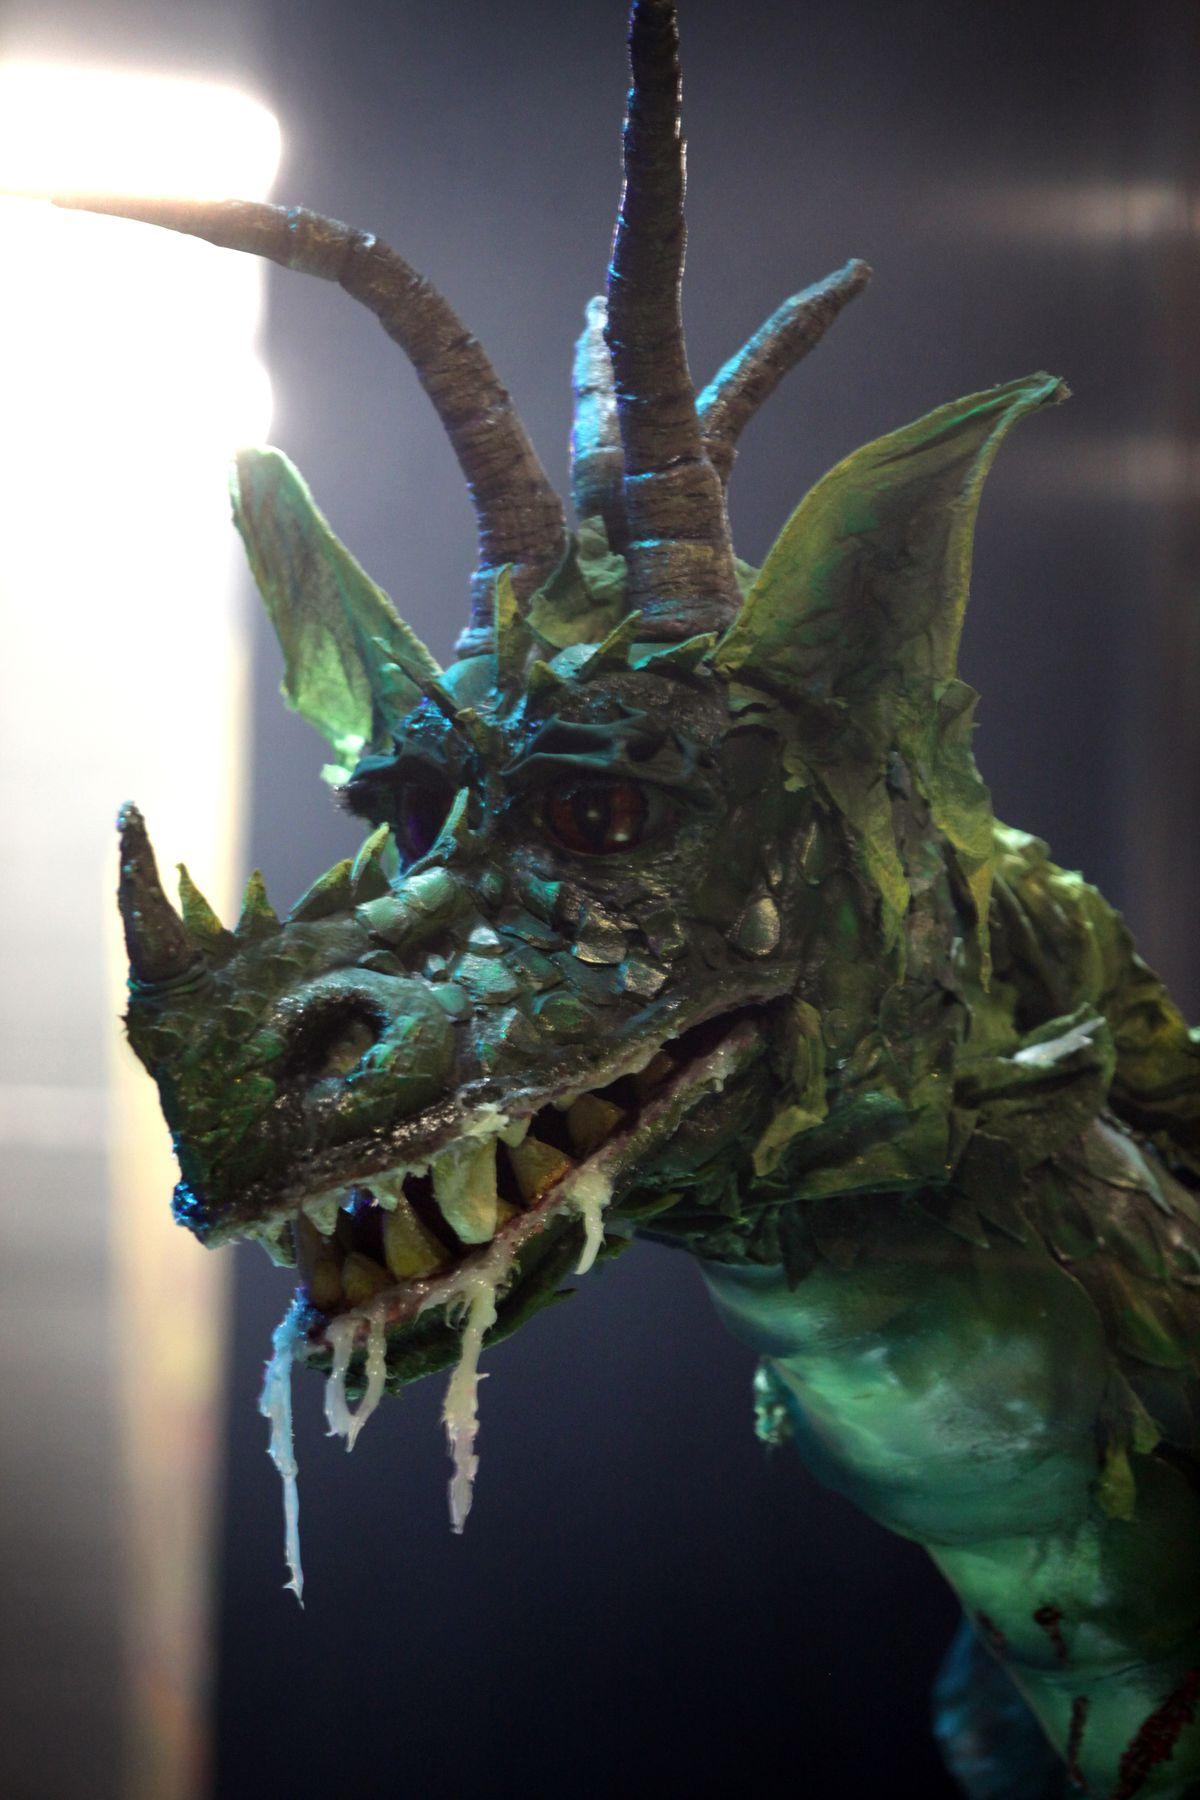 SID the Dragon